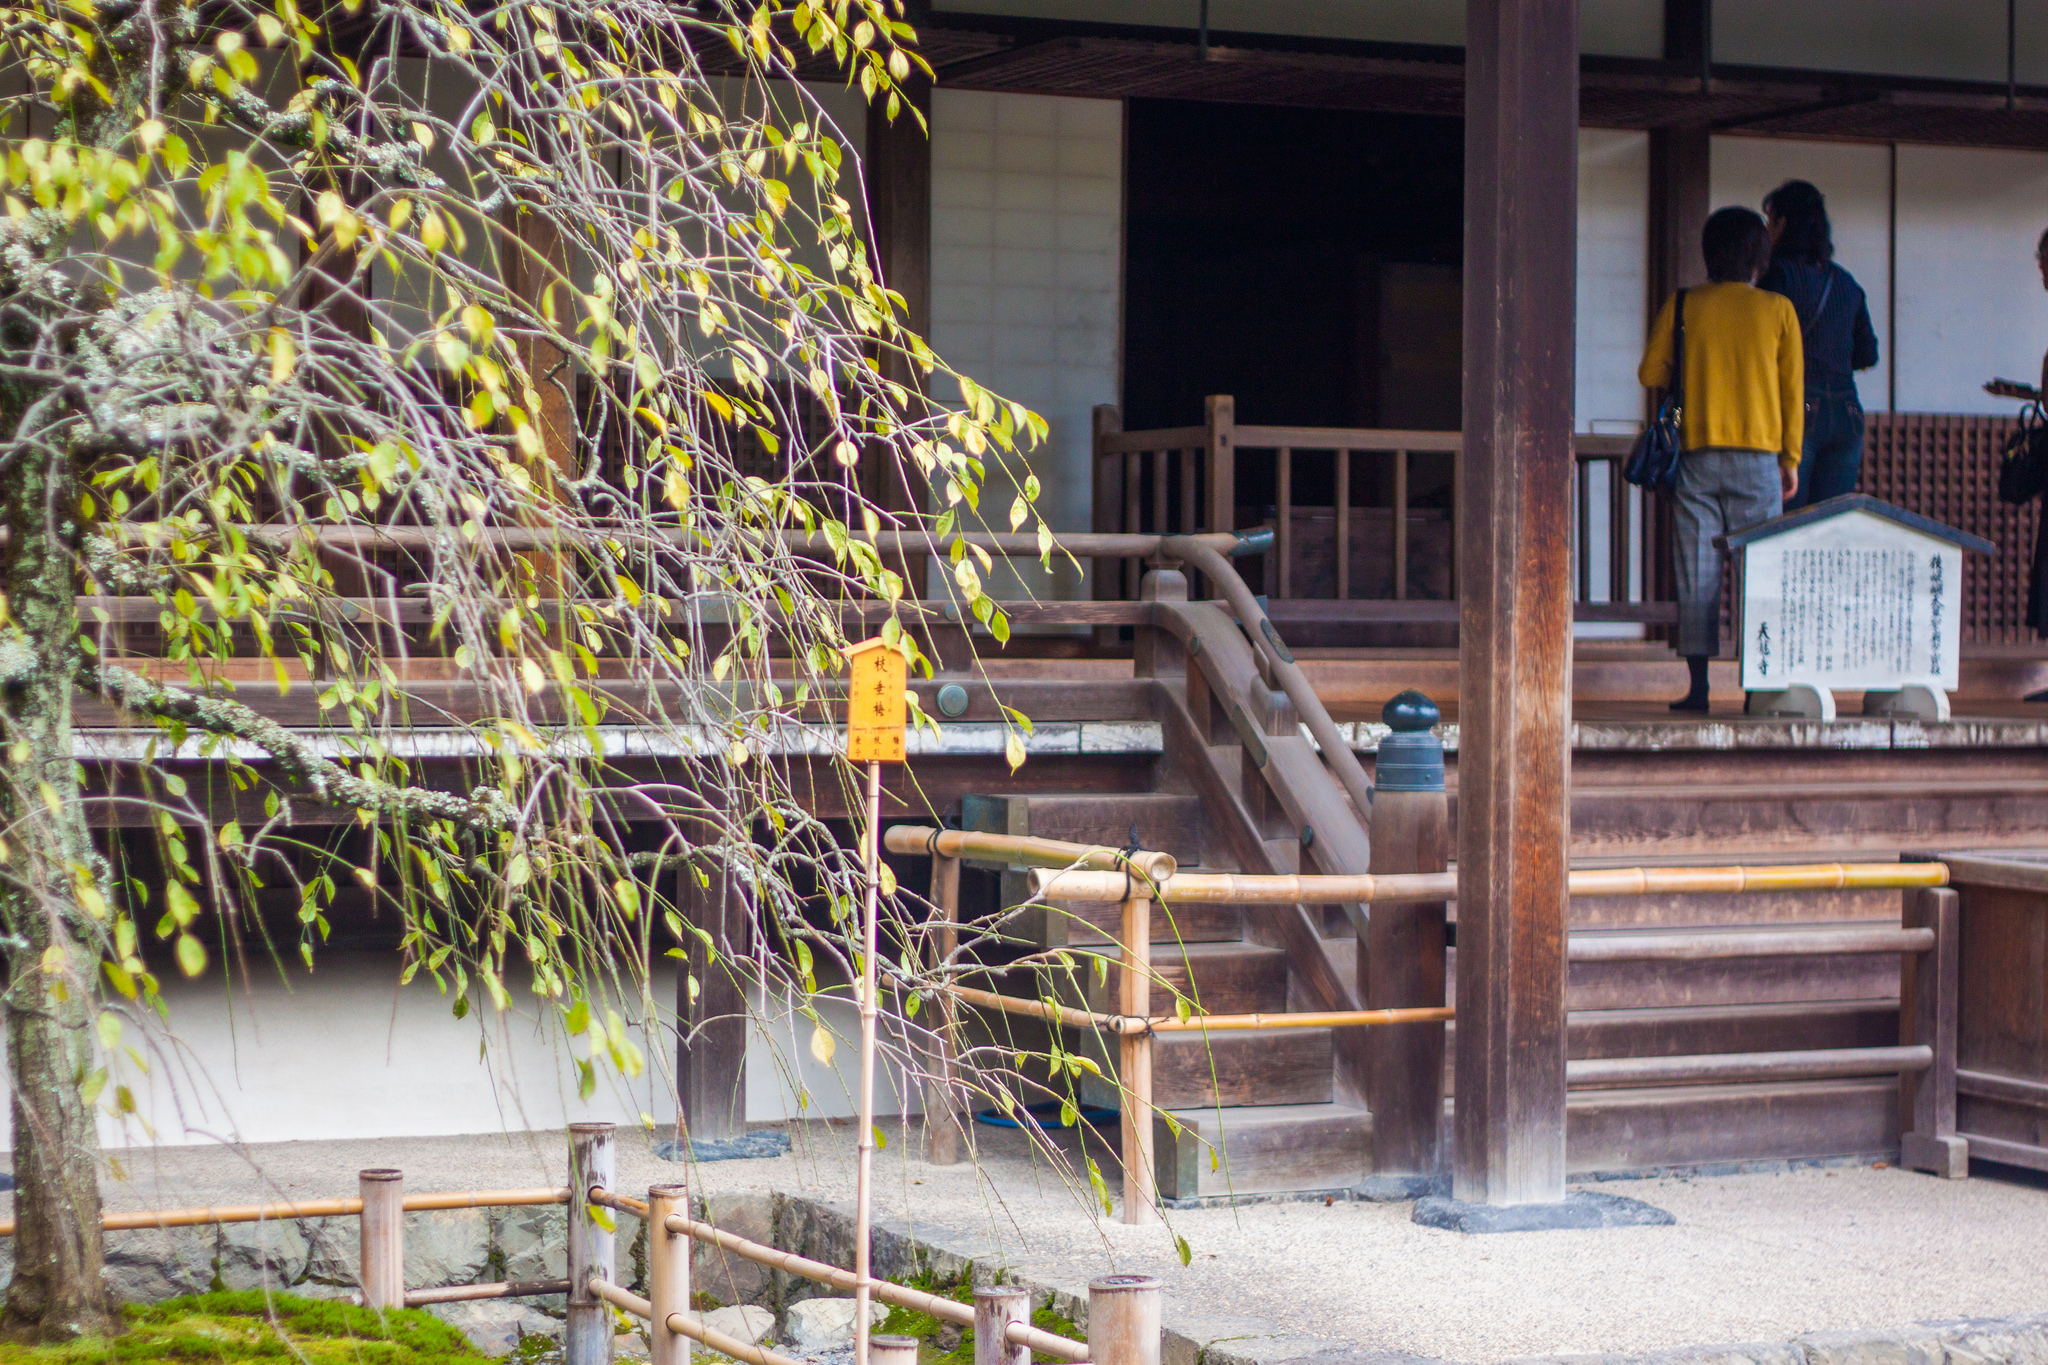 30074436140_6f4f0ebbcc_k.jpgA Guide to Finding your Zen in the Peaceful and Serene Gardens of Tenryu-ji Temple Arashiyama